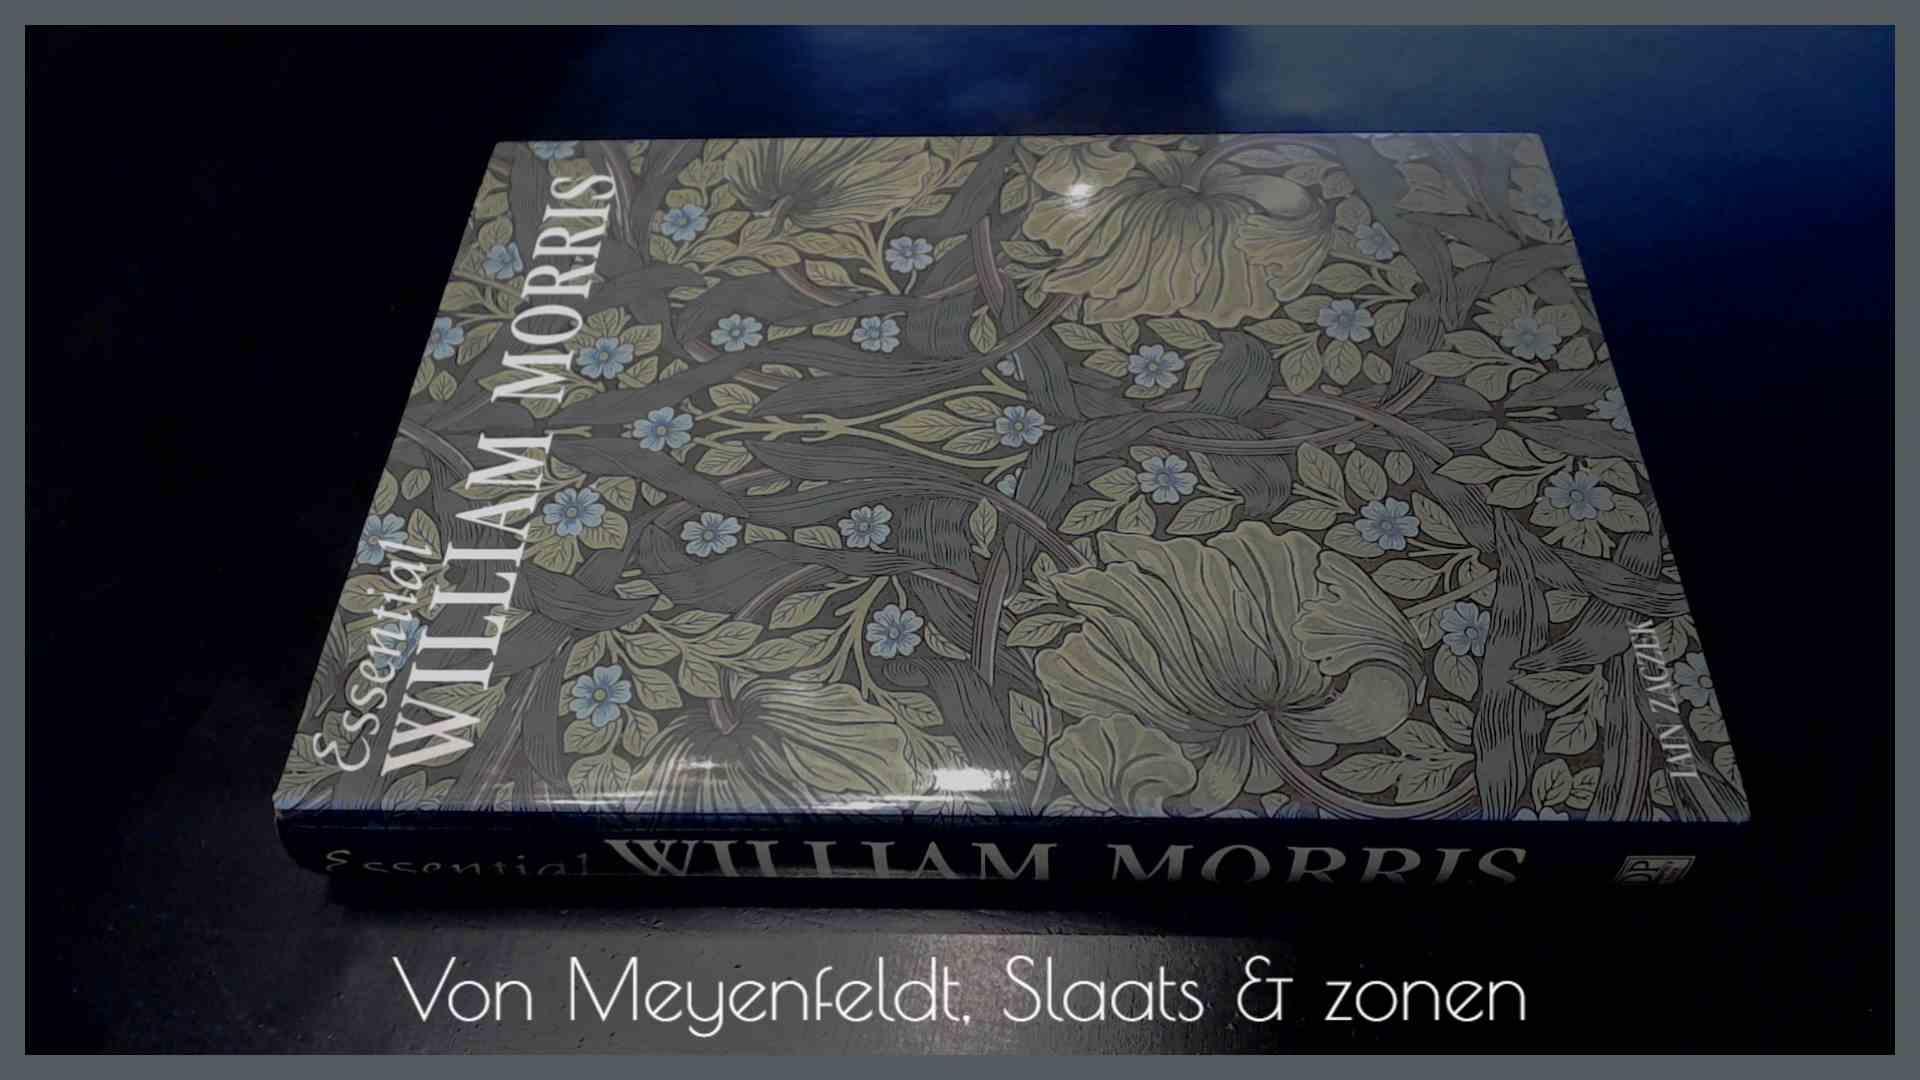 ZACZEK, IAIN - Essential William Morris